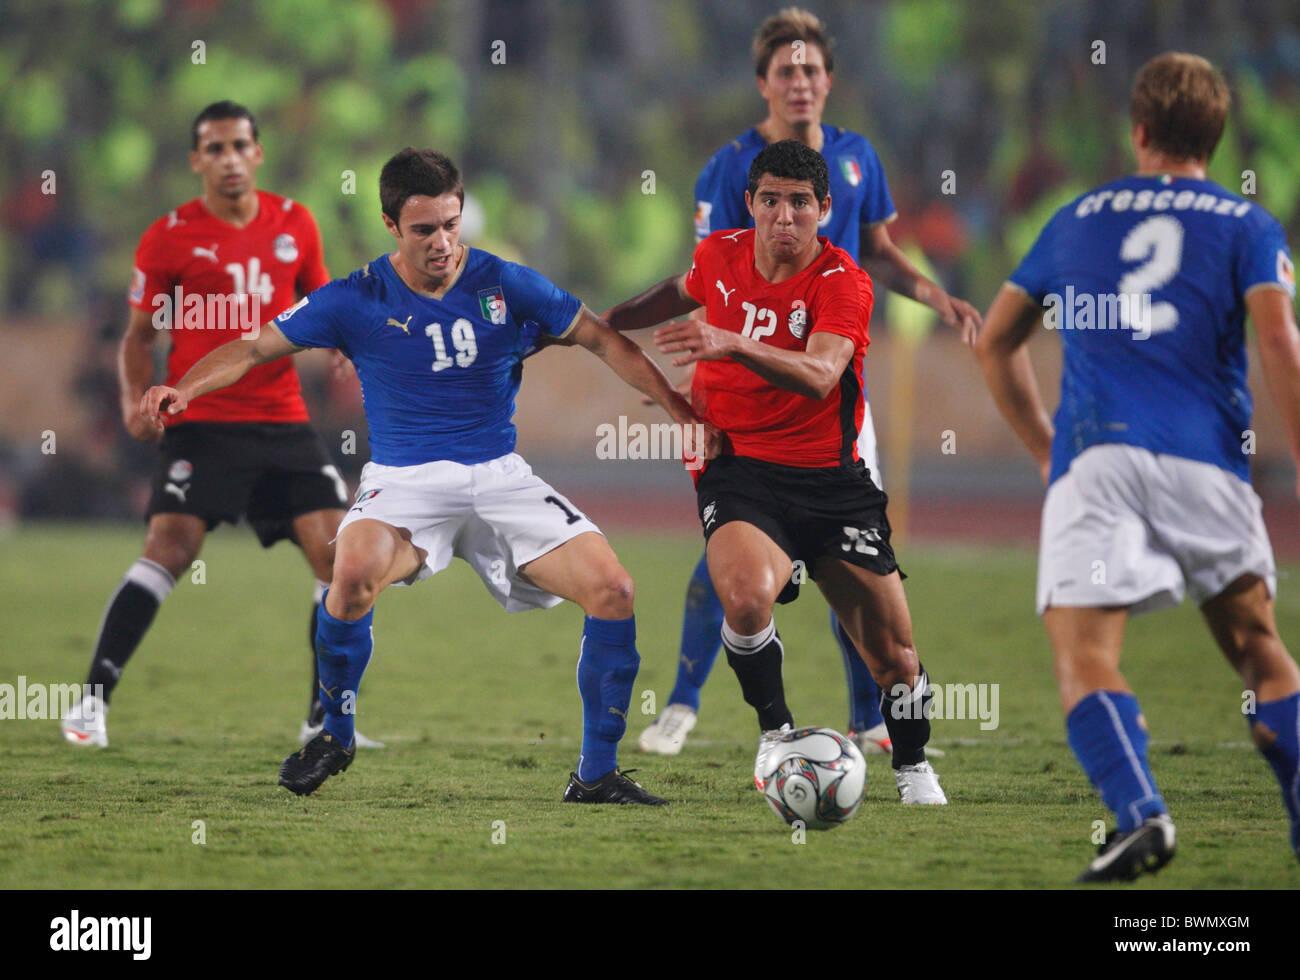 Marco Romizi Italiens (19) und Islam Ramadan in Ägypten (12) wetteifern um den Ball während des Spiels Stockbild